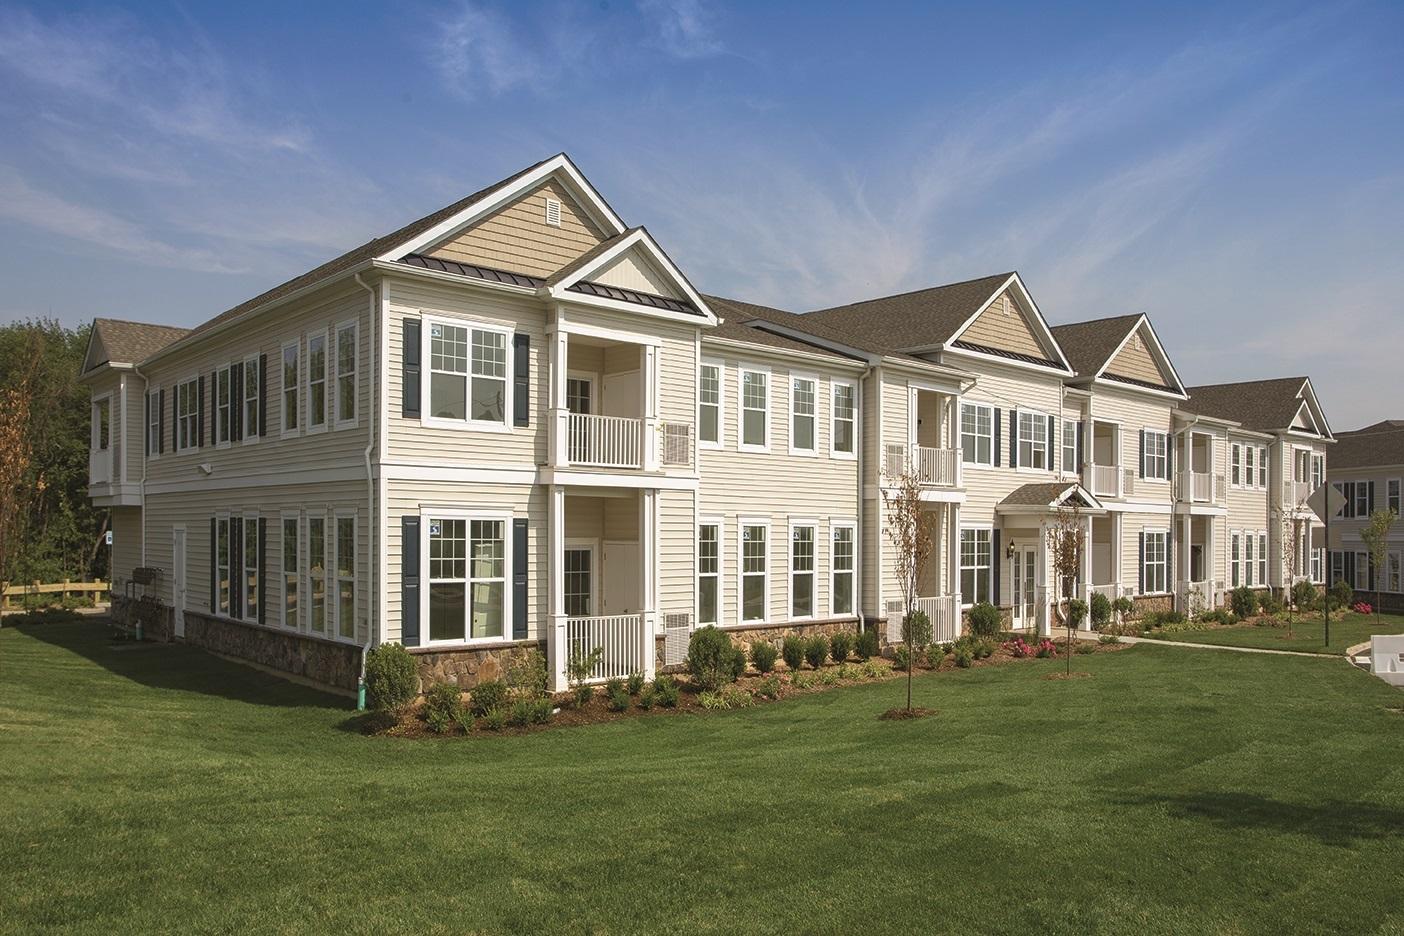 Multi Family Property Development : Single family feel in a plus multifamily property